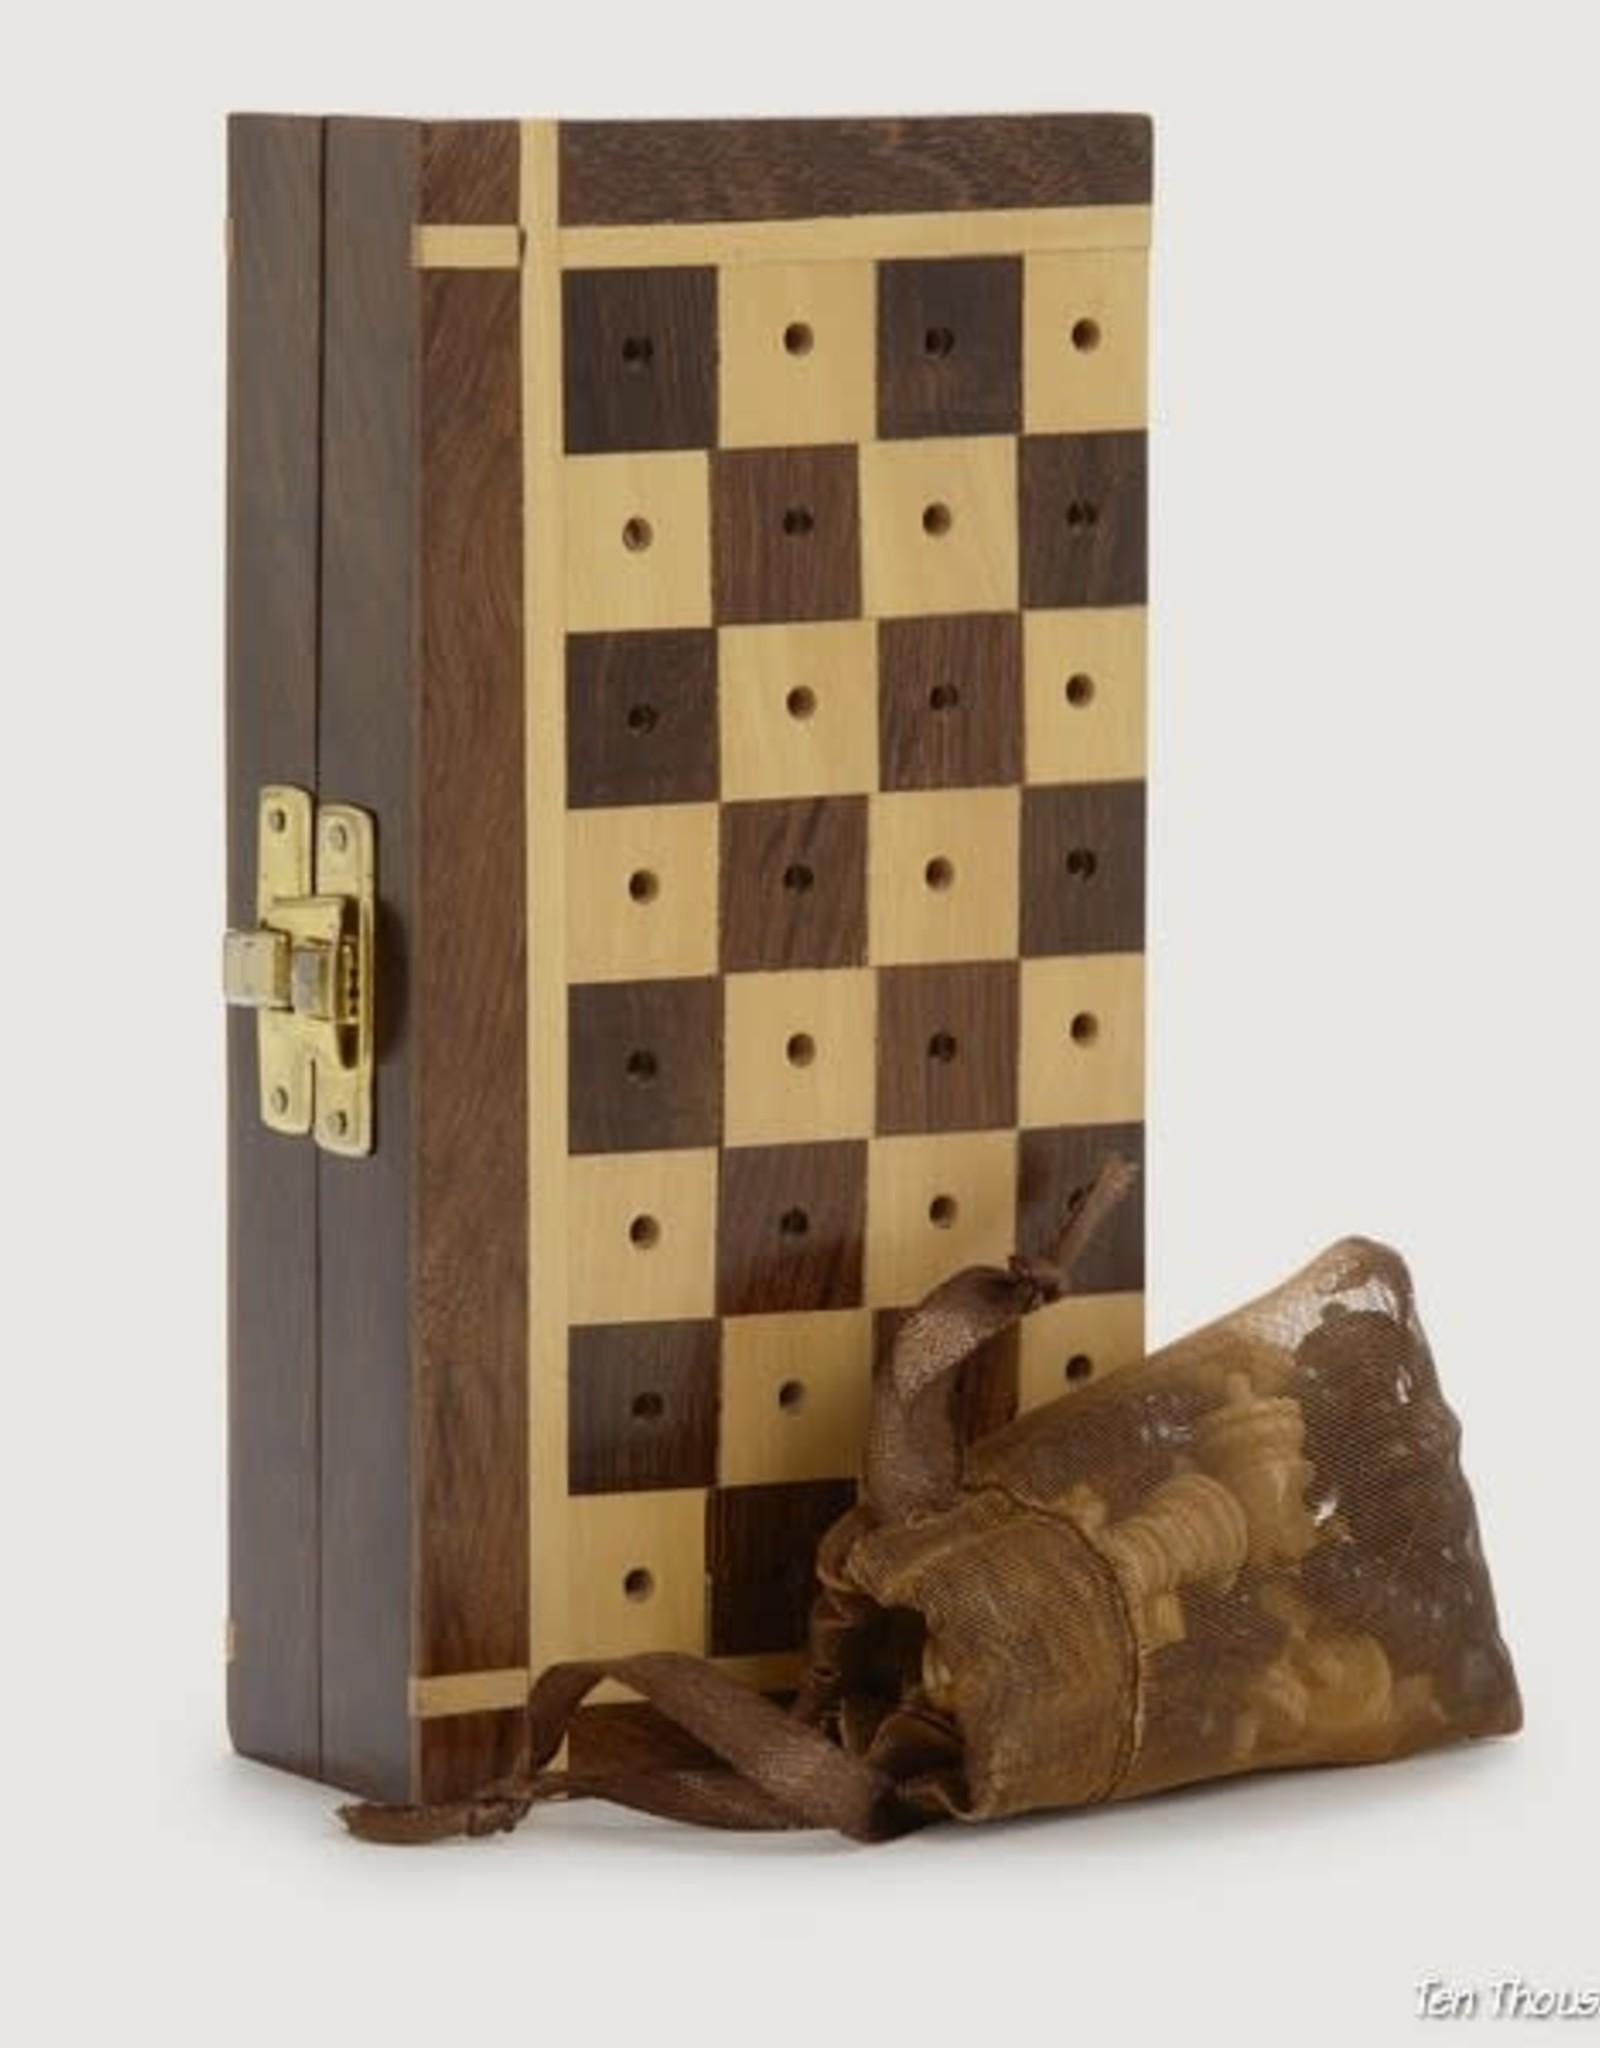 Ten Thousand Villages Shesham Travel Chess Set